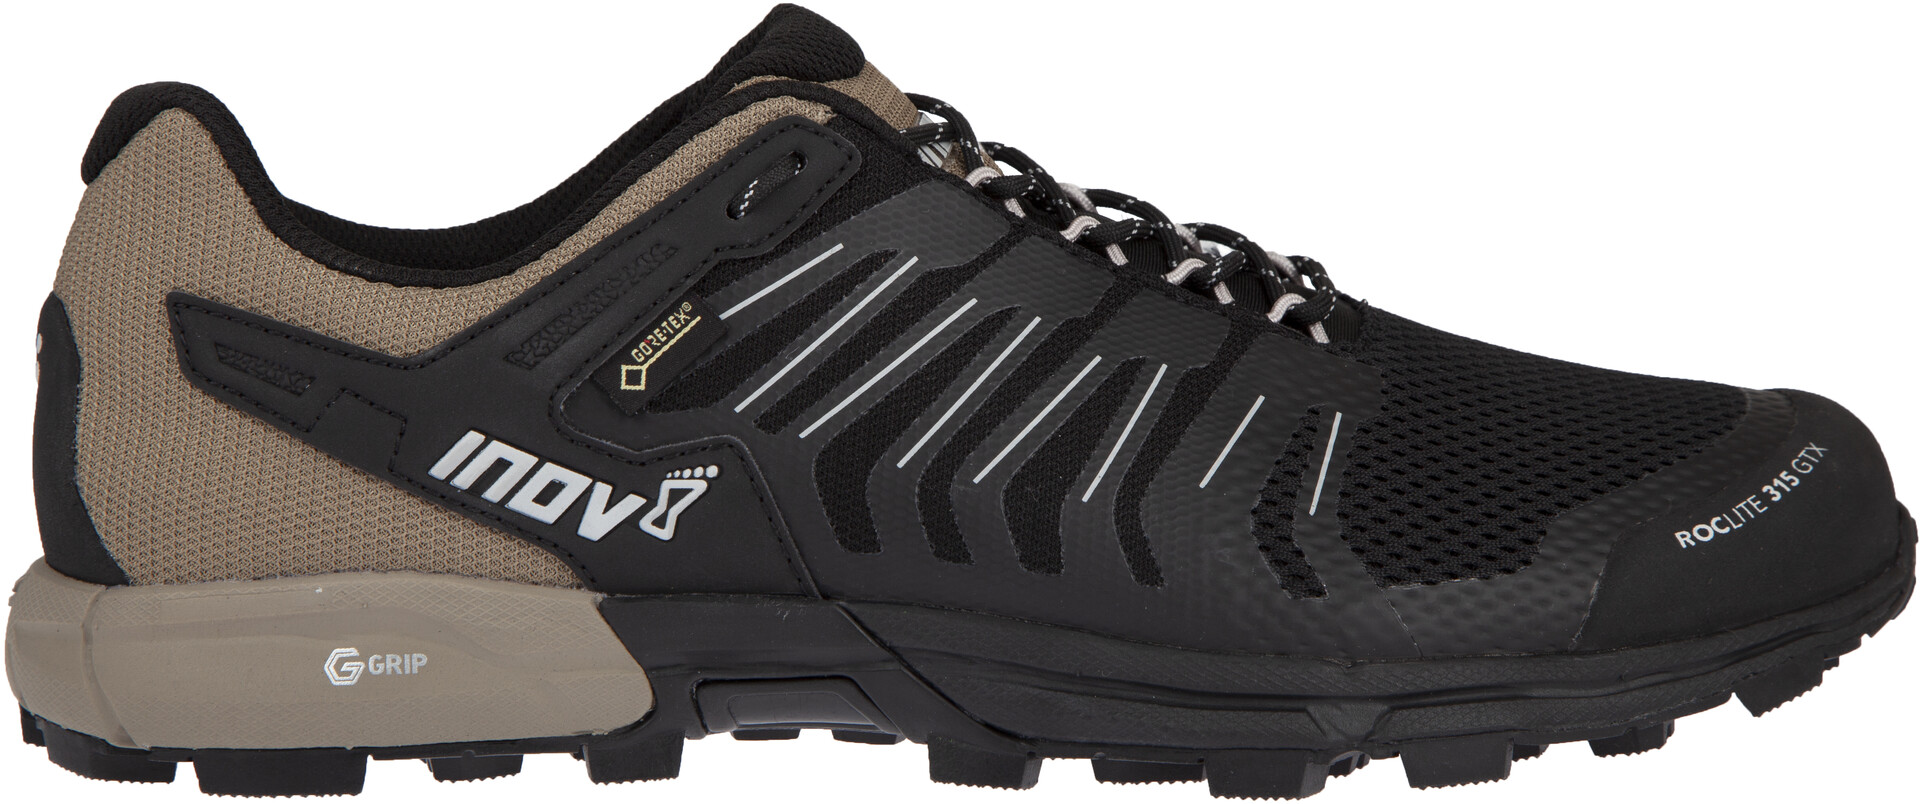 inov-8 Roclite 315 GTX Running Shoes Men brown/black at Addnature.co.uk